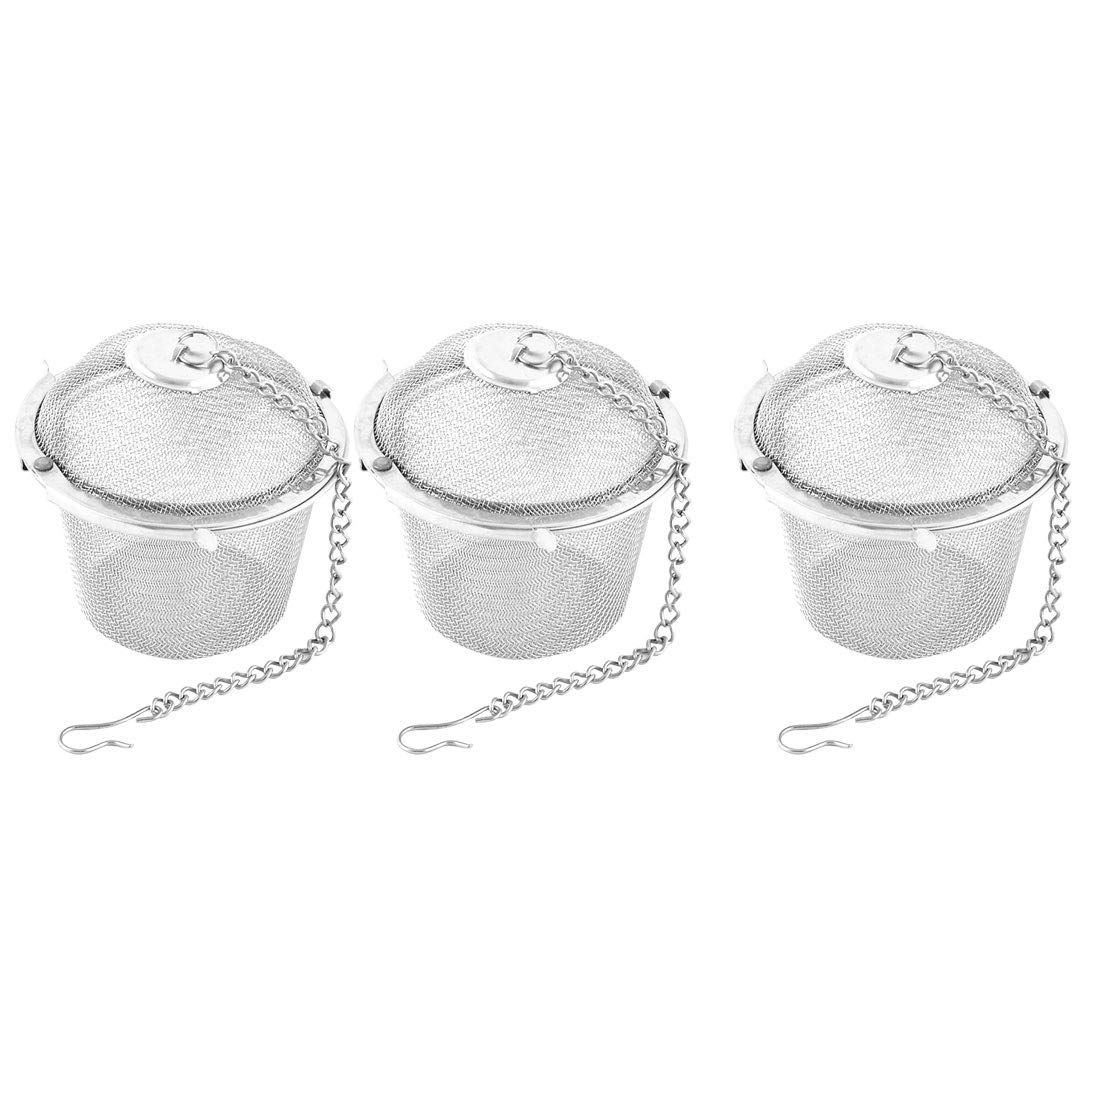 OKSLO Kitchen stainless steel multi use tea spice seasoning infuser strainer 3pcs